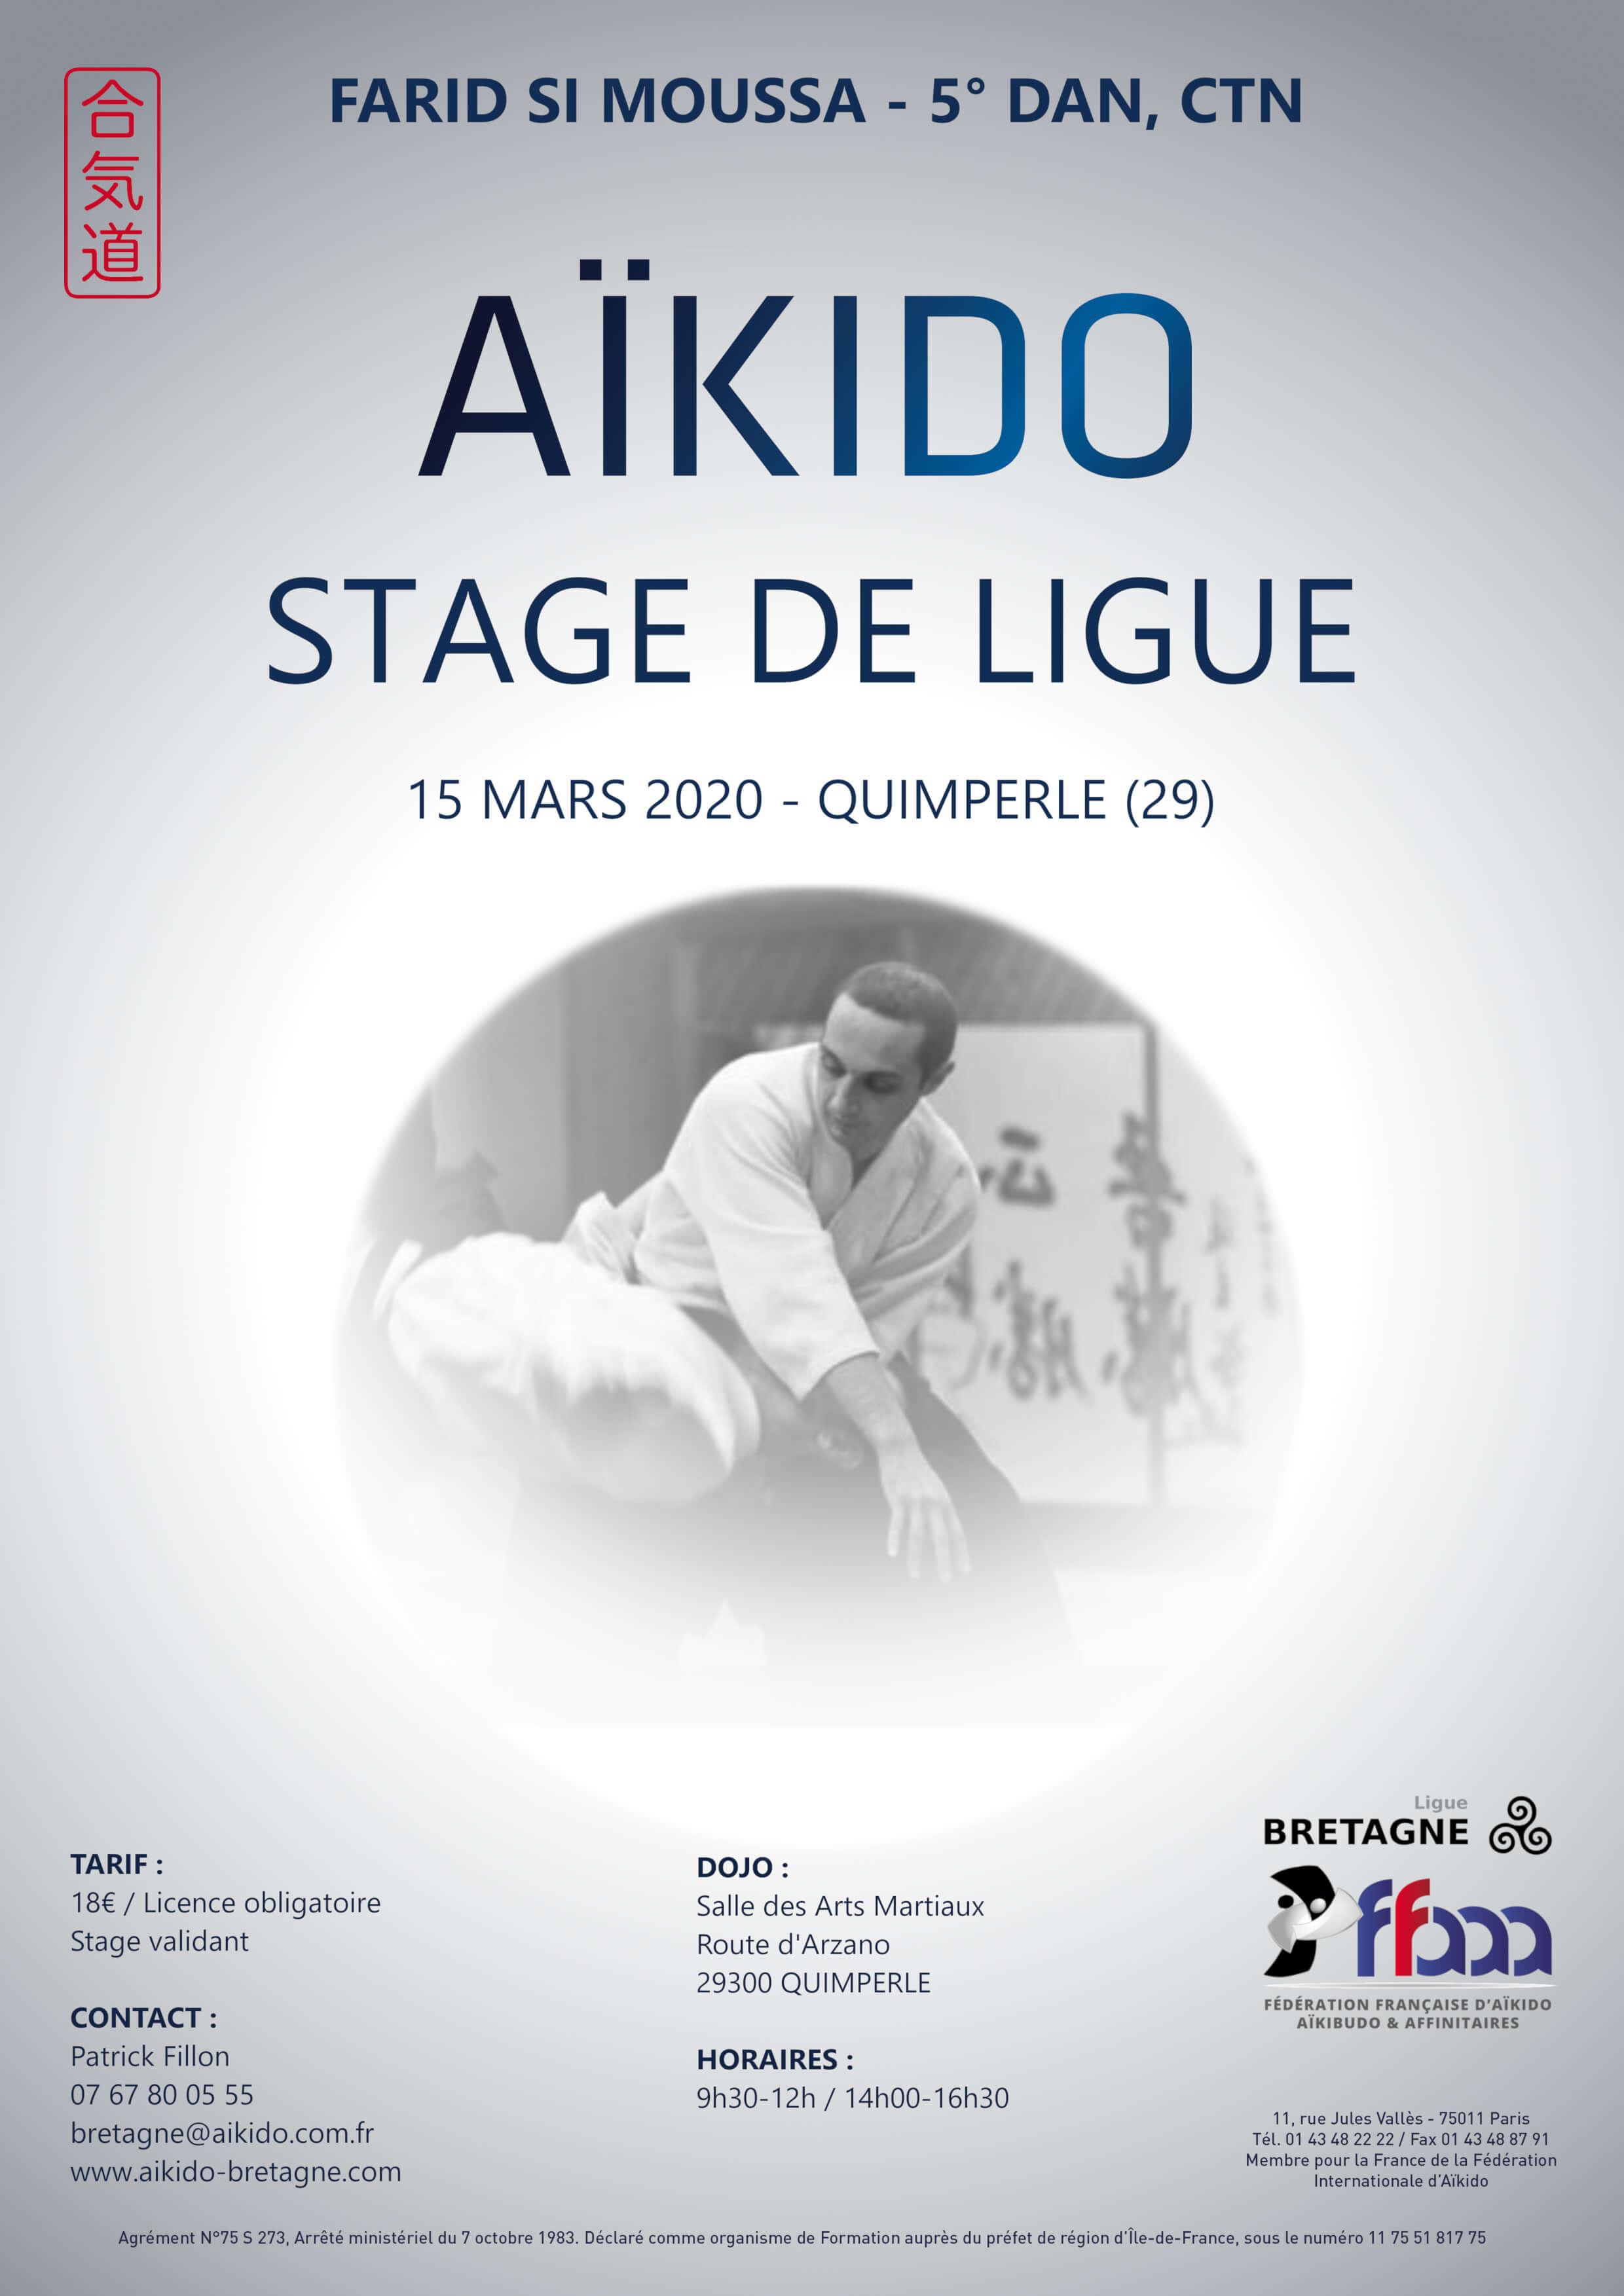 https://www.aikido-bretagne.com/wp-content/uploads/2019/10/Affiche-Stage-Ligue-Quimperle-Farid-Si-Moussa-15-mars-2020-a4-comp